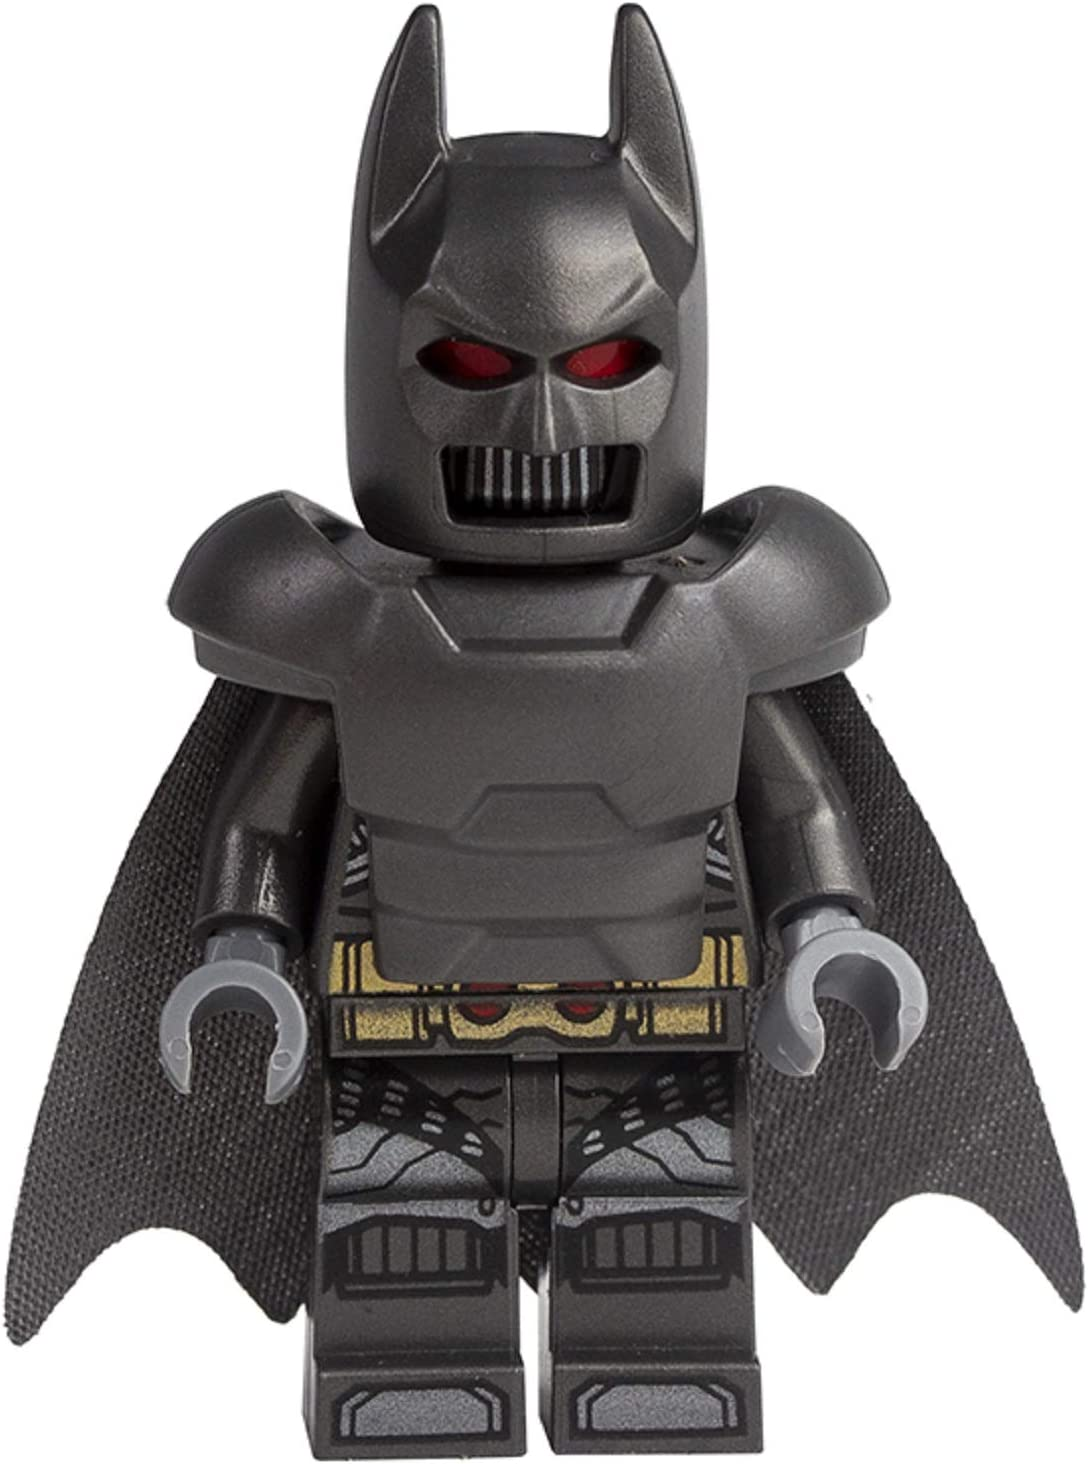 LEGO Superheroes: Heavy Armored Batman with Cape